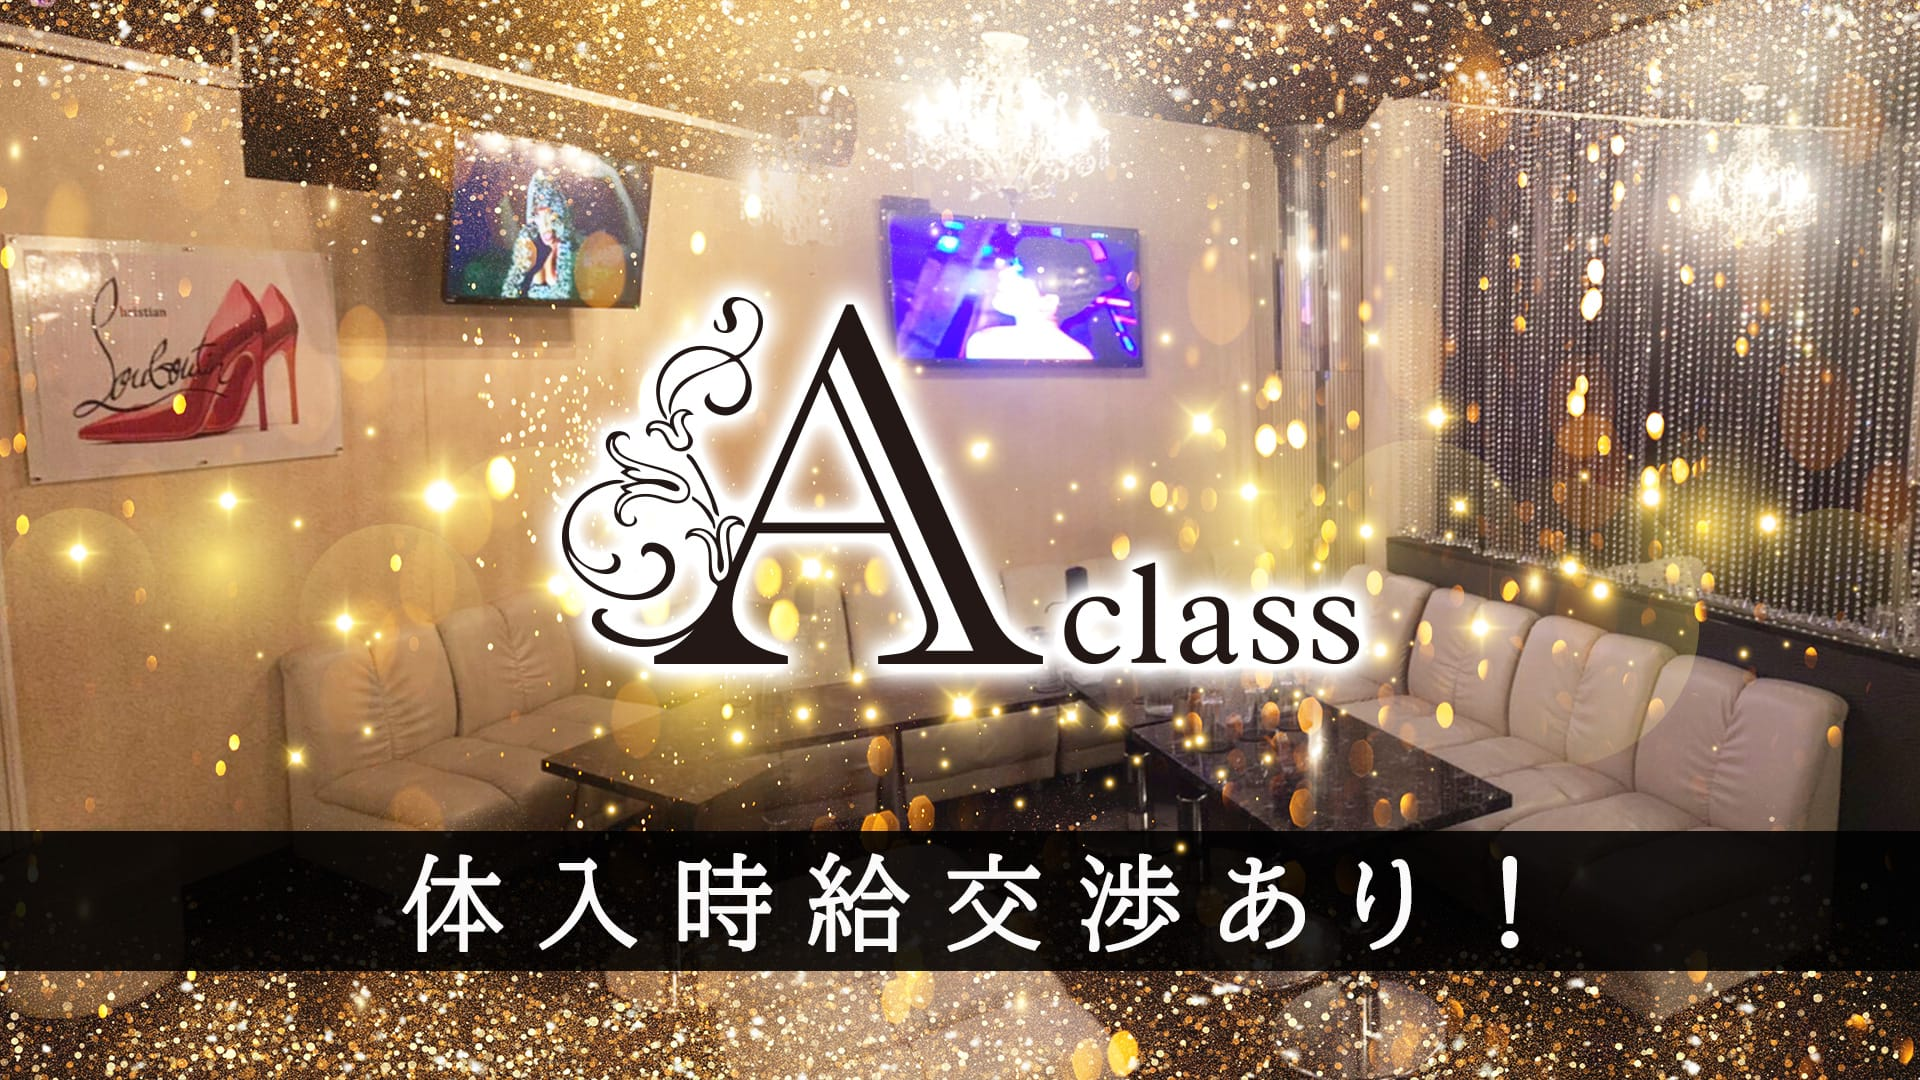 CLUB A-class(エークラス) 甲府キャバクラ TOP画像